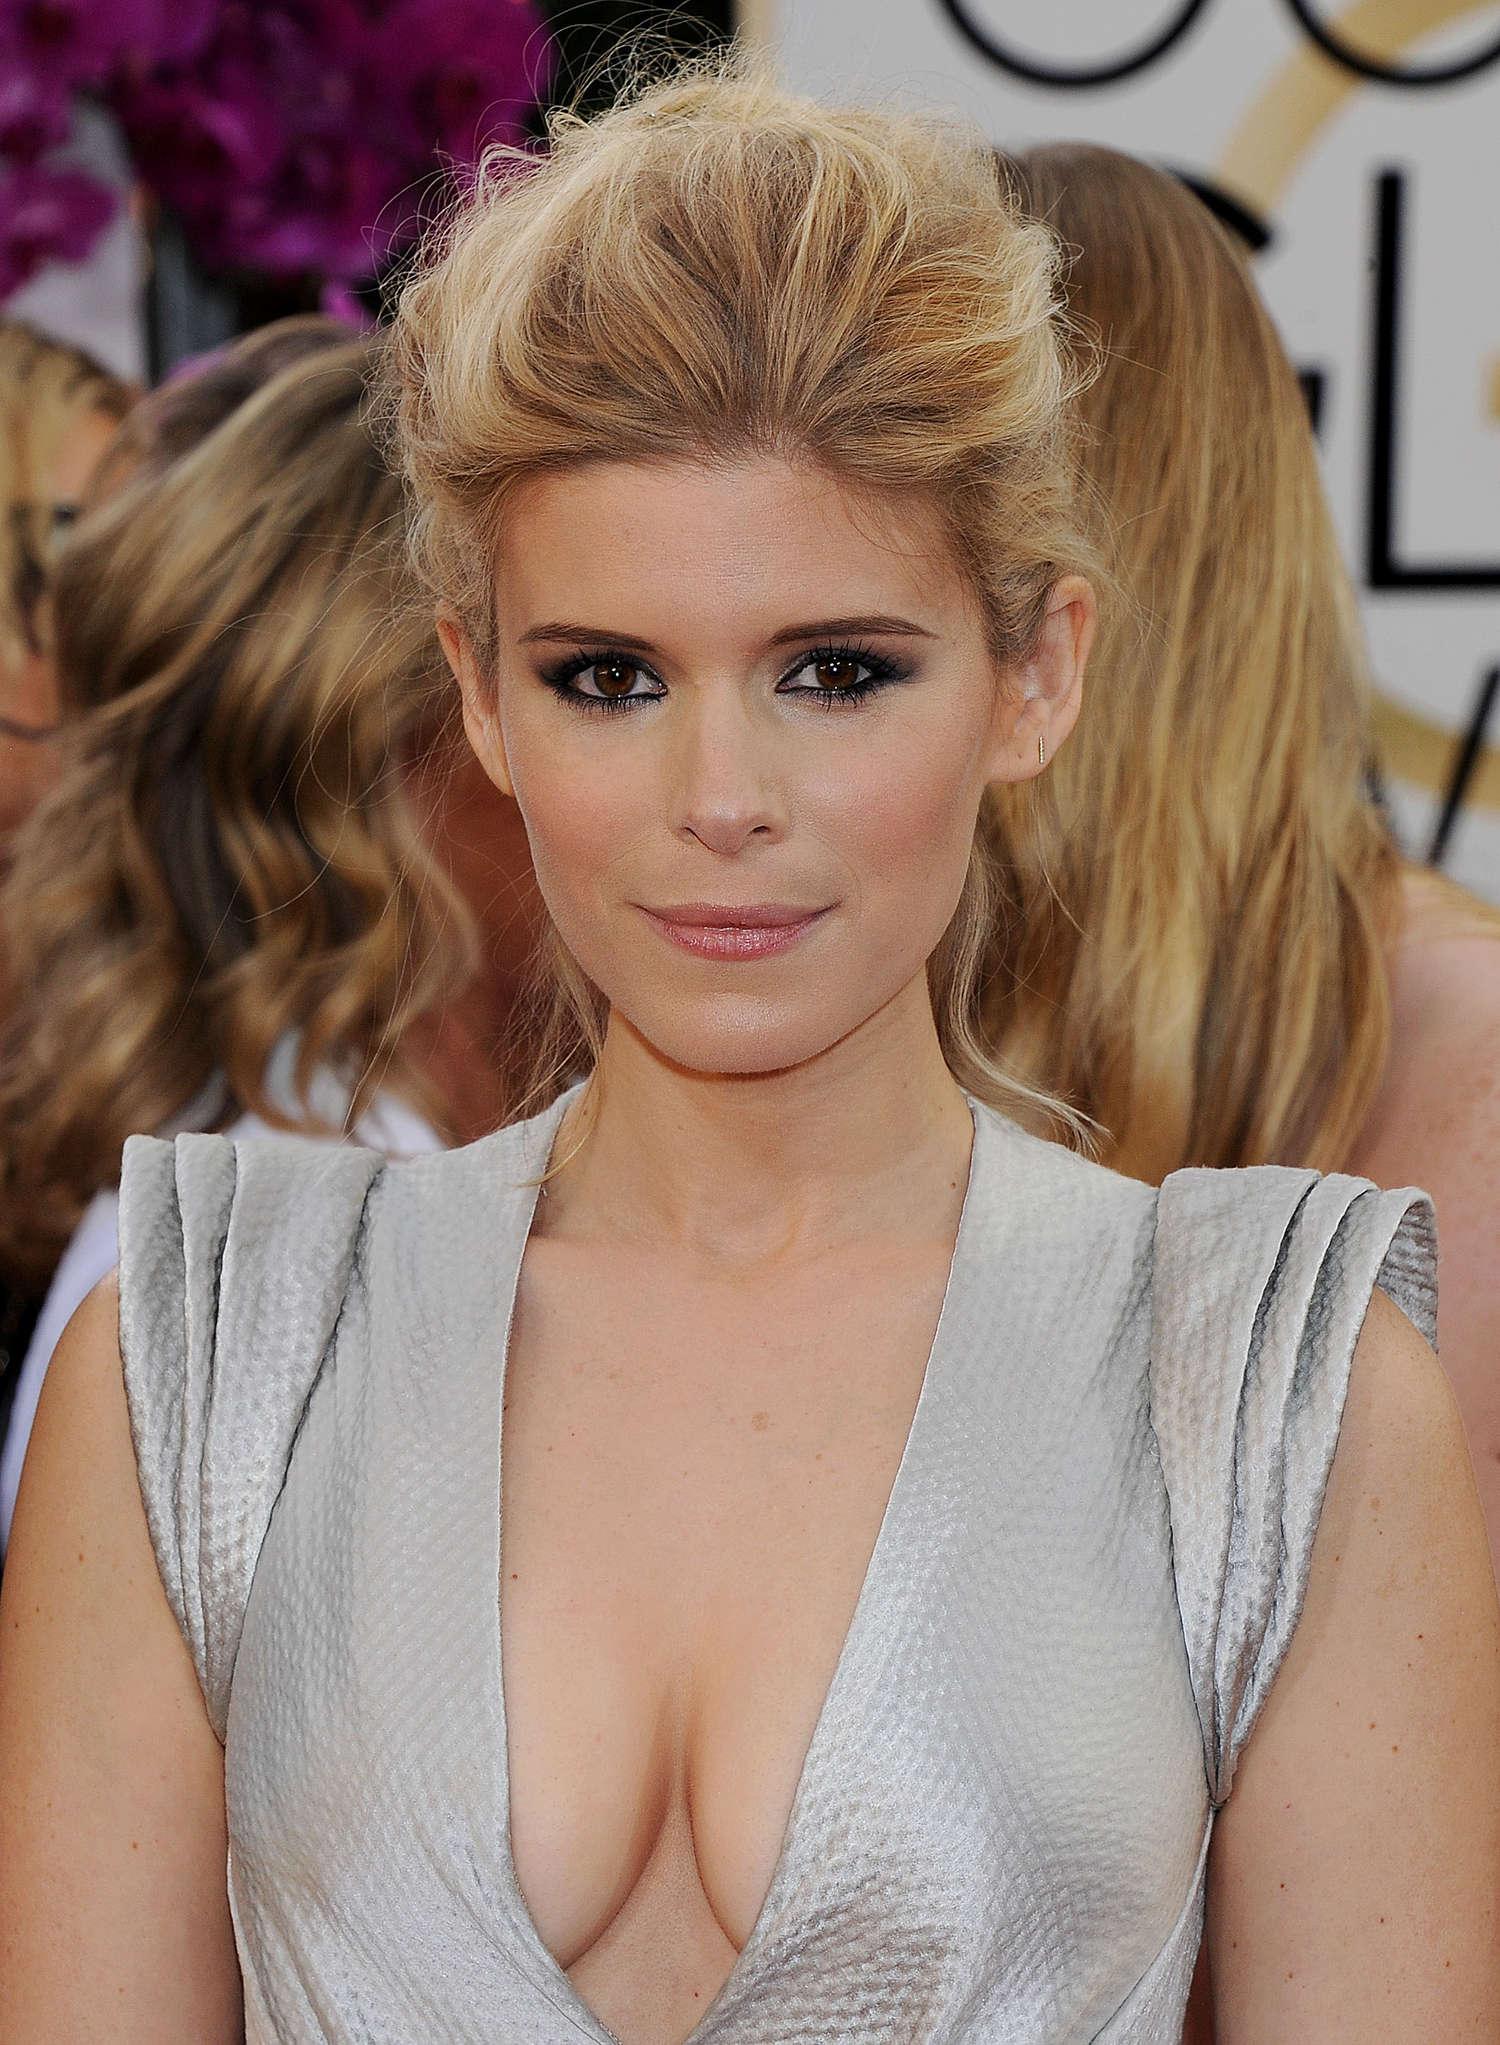 Kate Mara Golden Globe 2014 Awards 05 Gotceleb